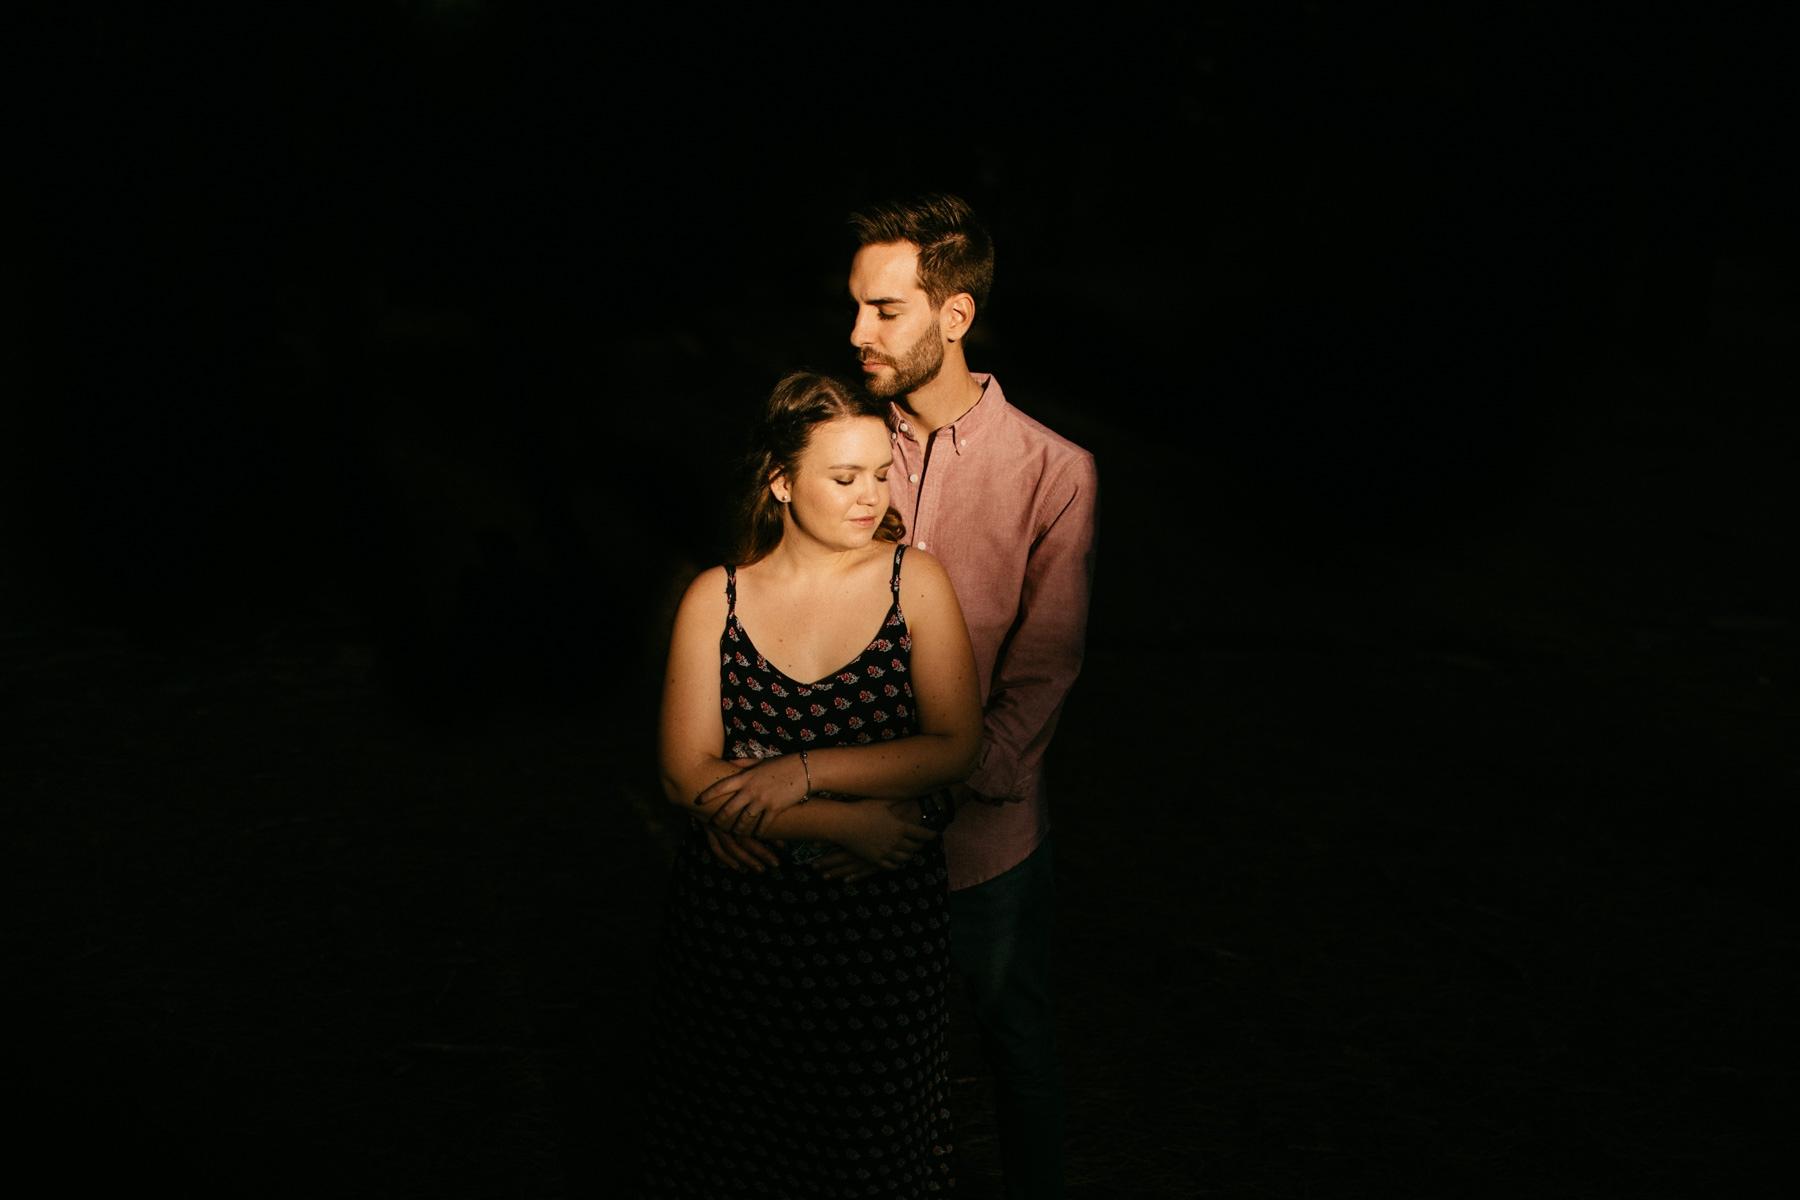 fotografo de bodas Jairo Crena-233